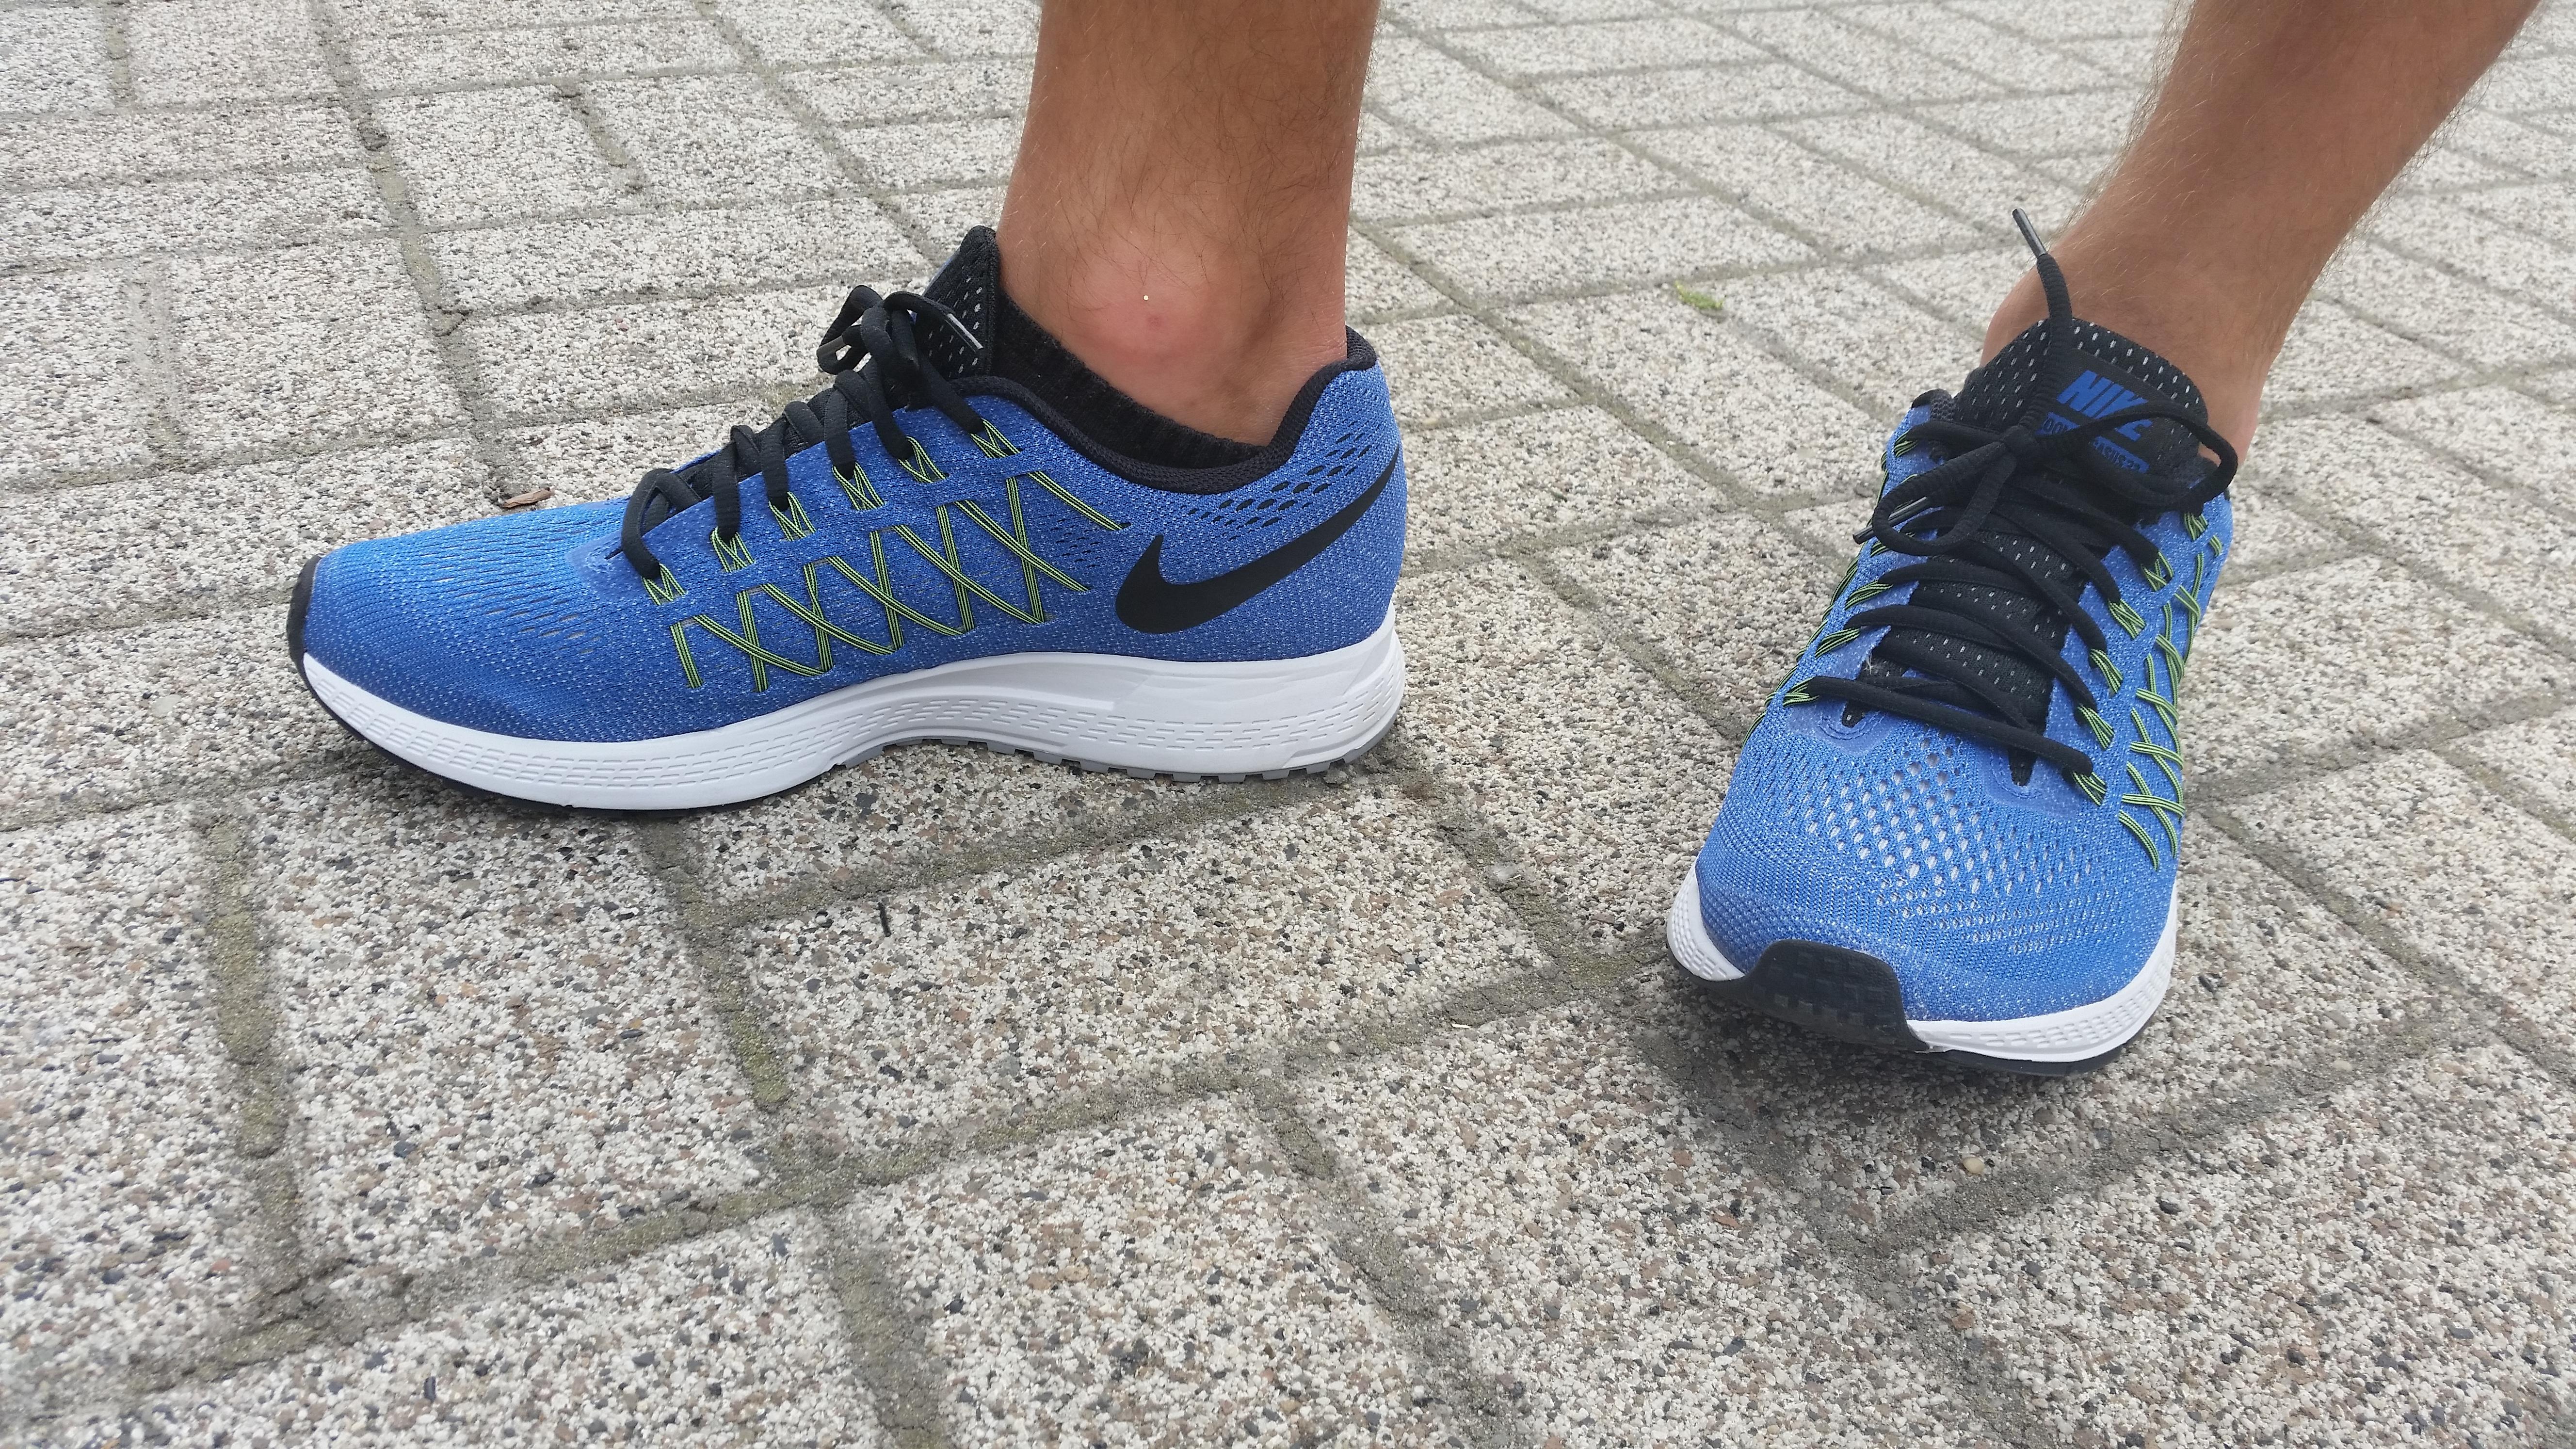 Nike Zoom Pegasus 32 TEST LubelskiBiegacz.pl